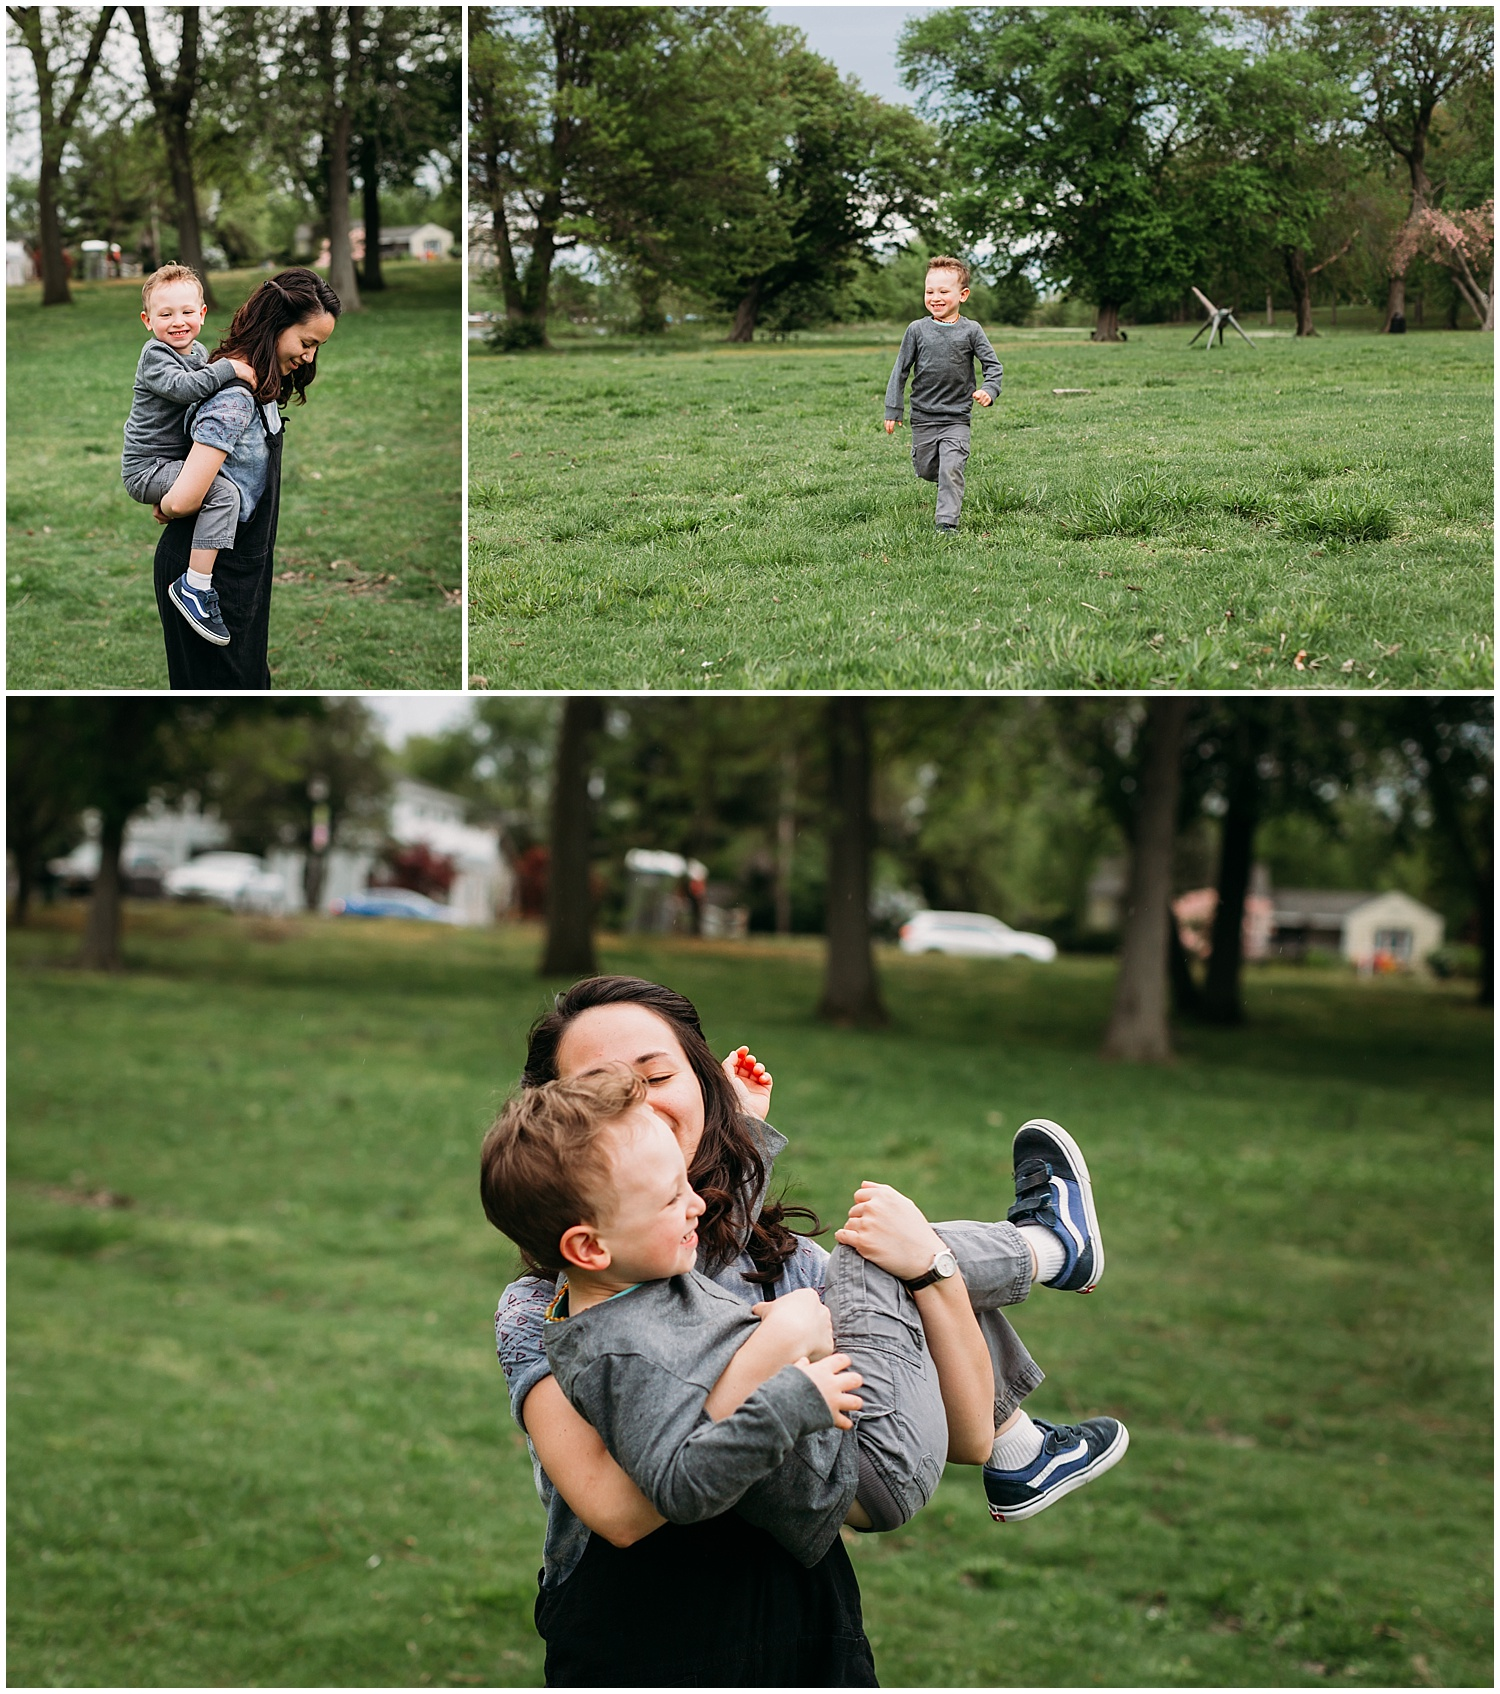 collingswood-new-jersey-motherhood-mini-photo-session_0012.jpg